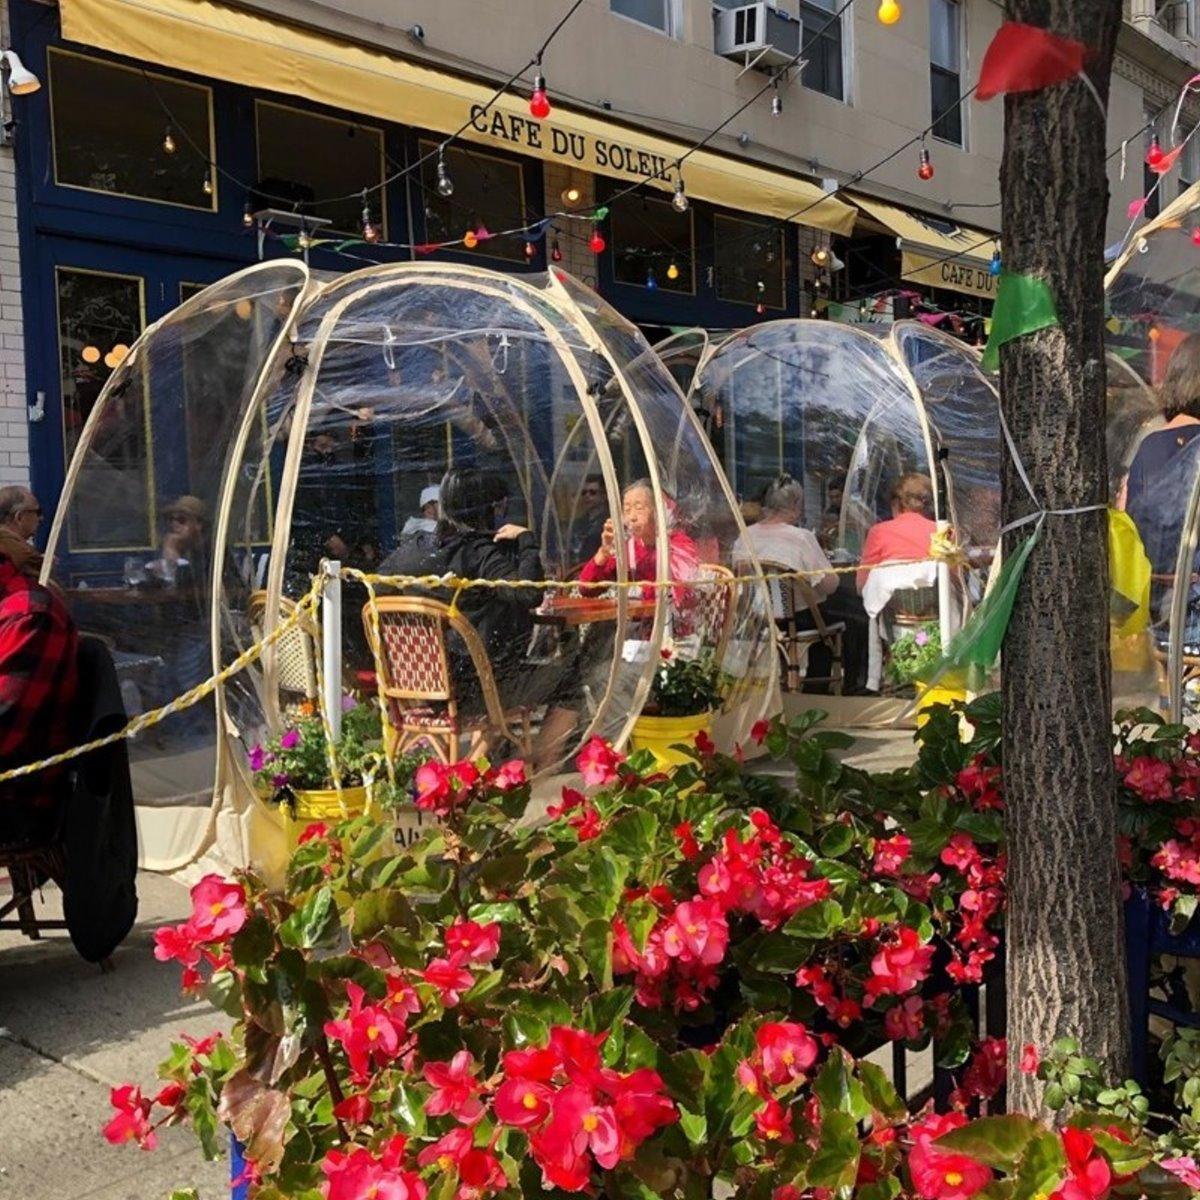 Cafe du Soleil εστιατόρια τον χειμώνα μέσα σε φούσκες